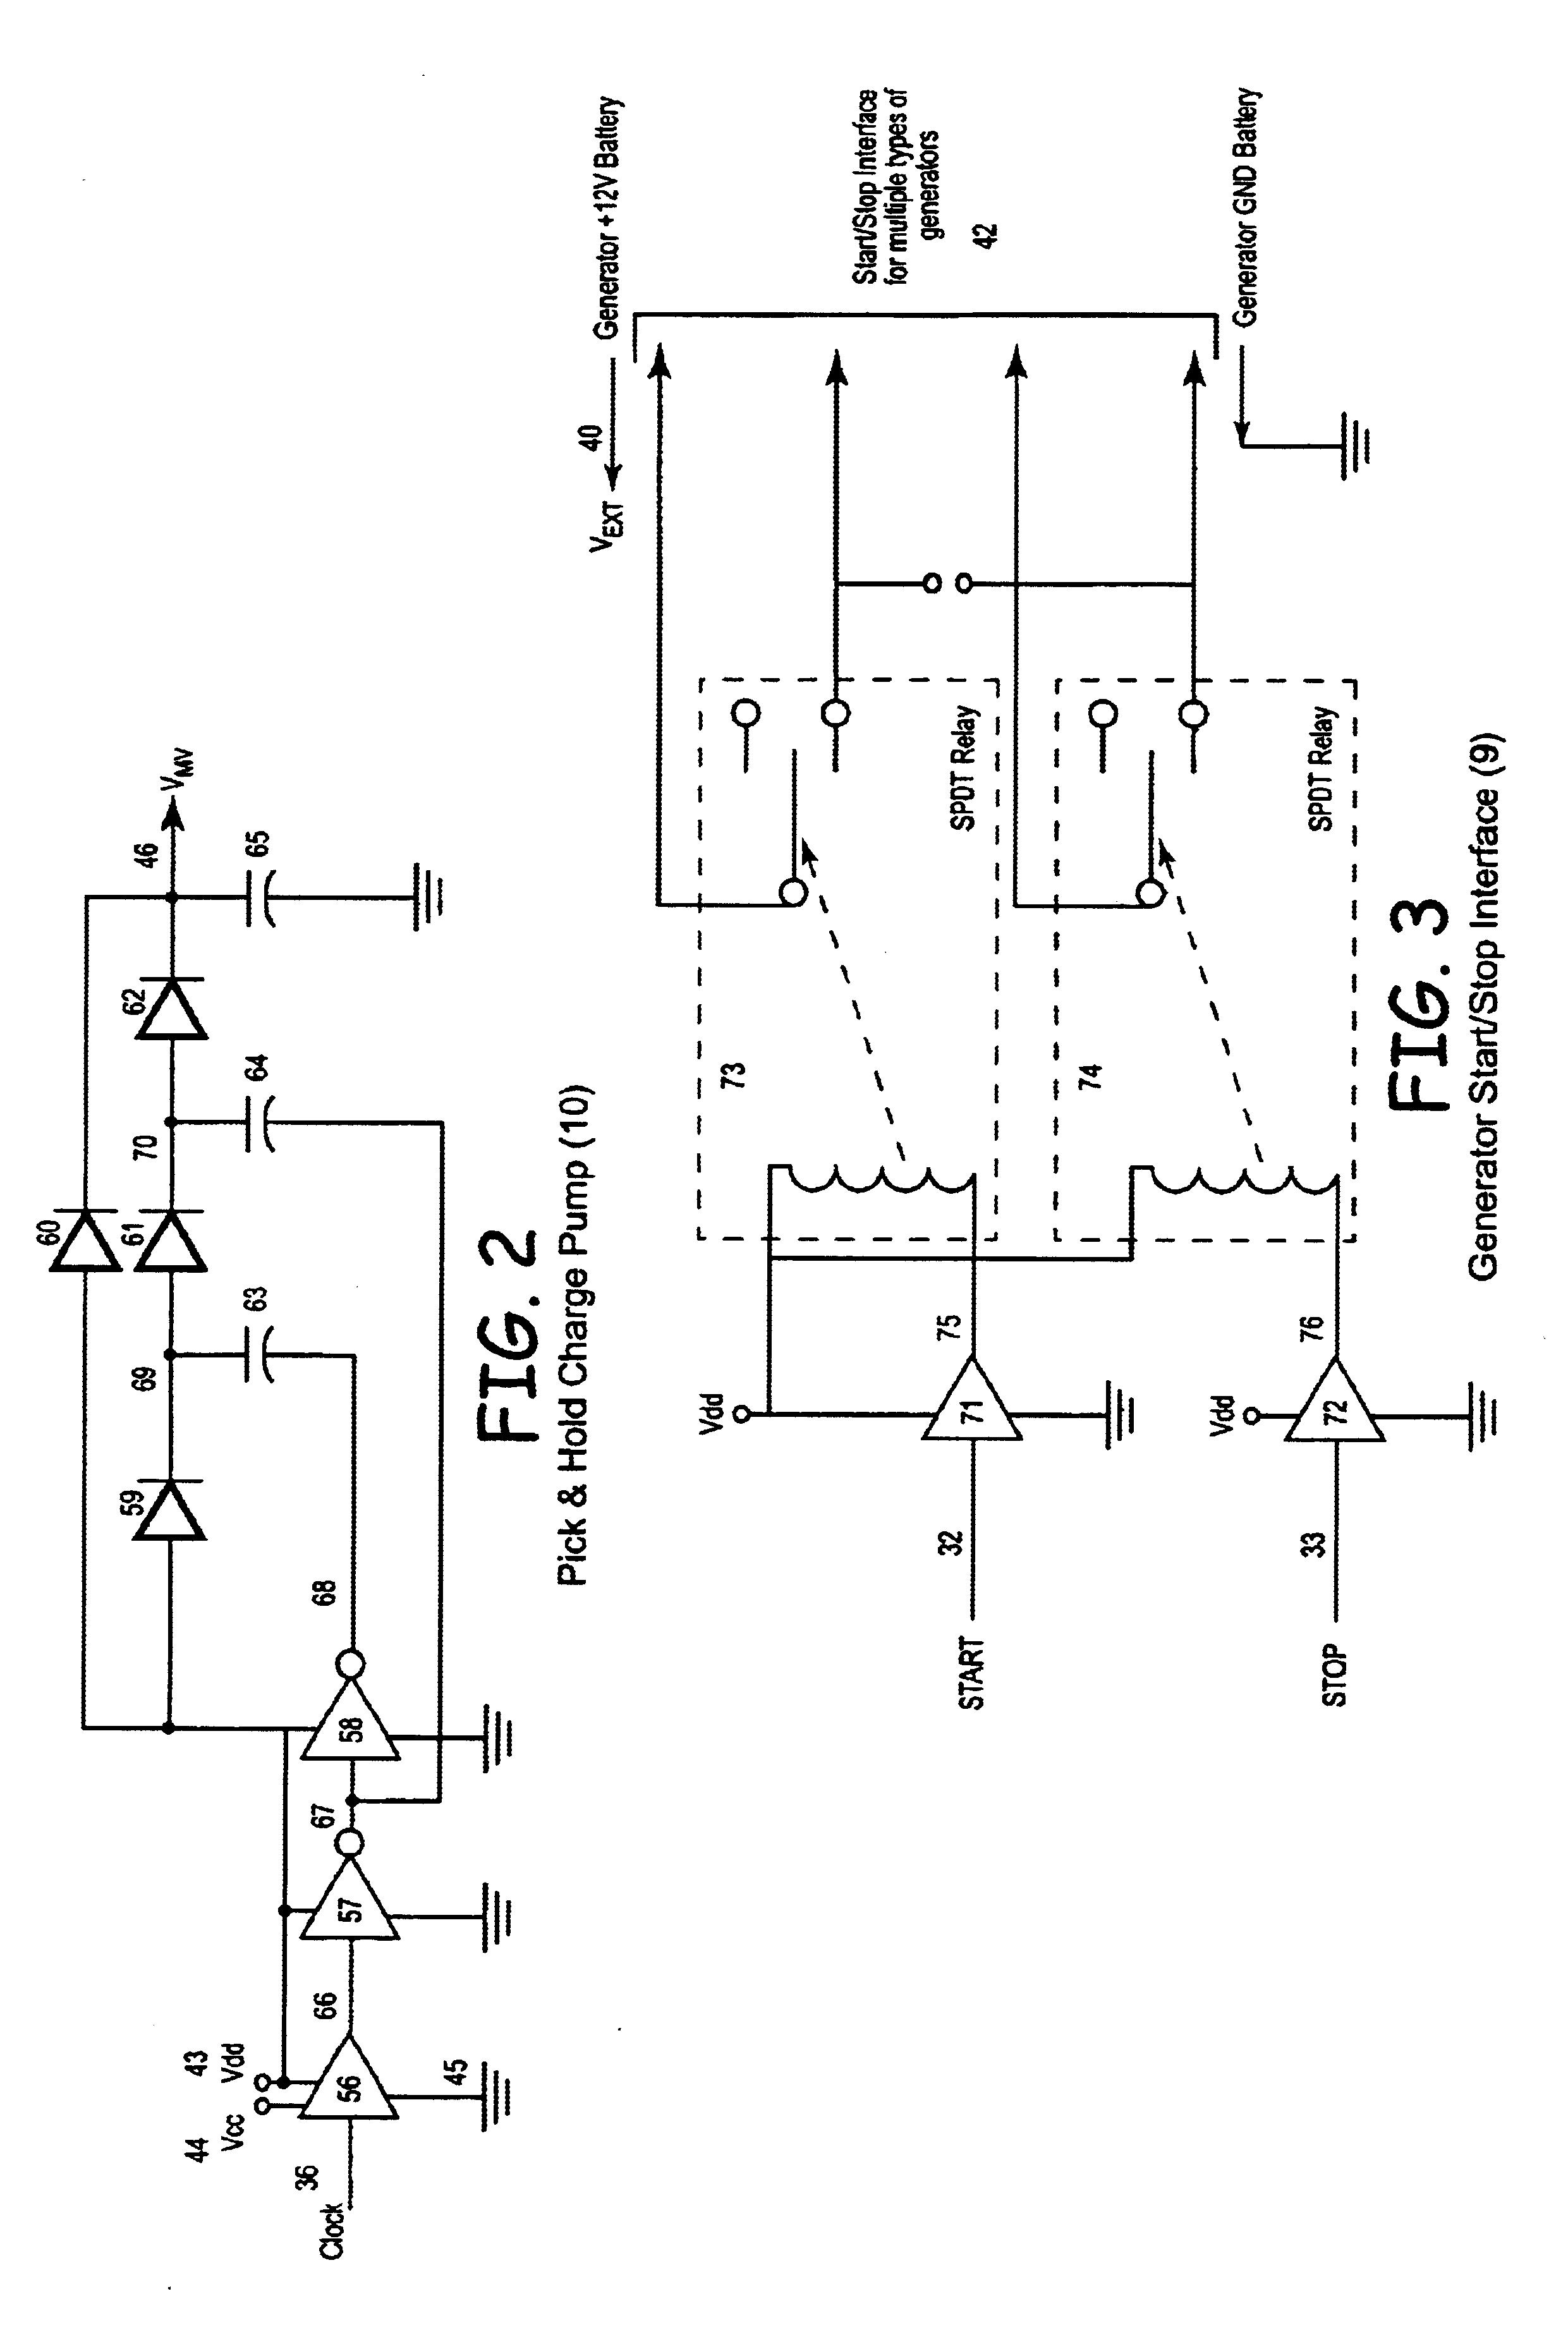 asco 165 transfer switch wiring diagram periodic. Black Bedroom Furniture Sets. Home Design Ideas